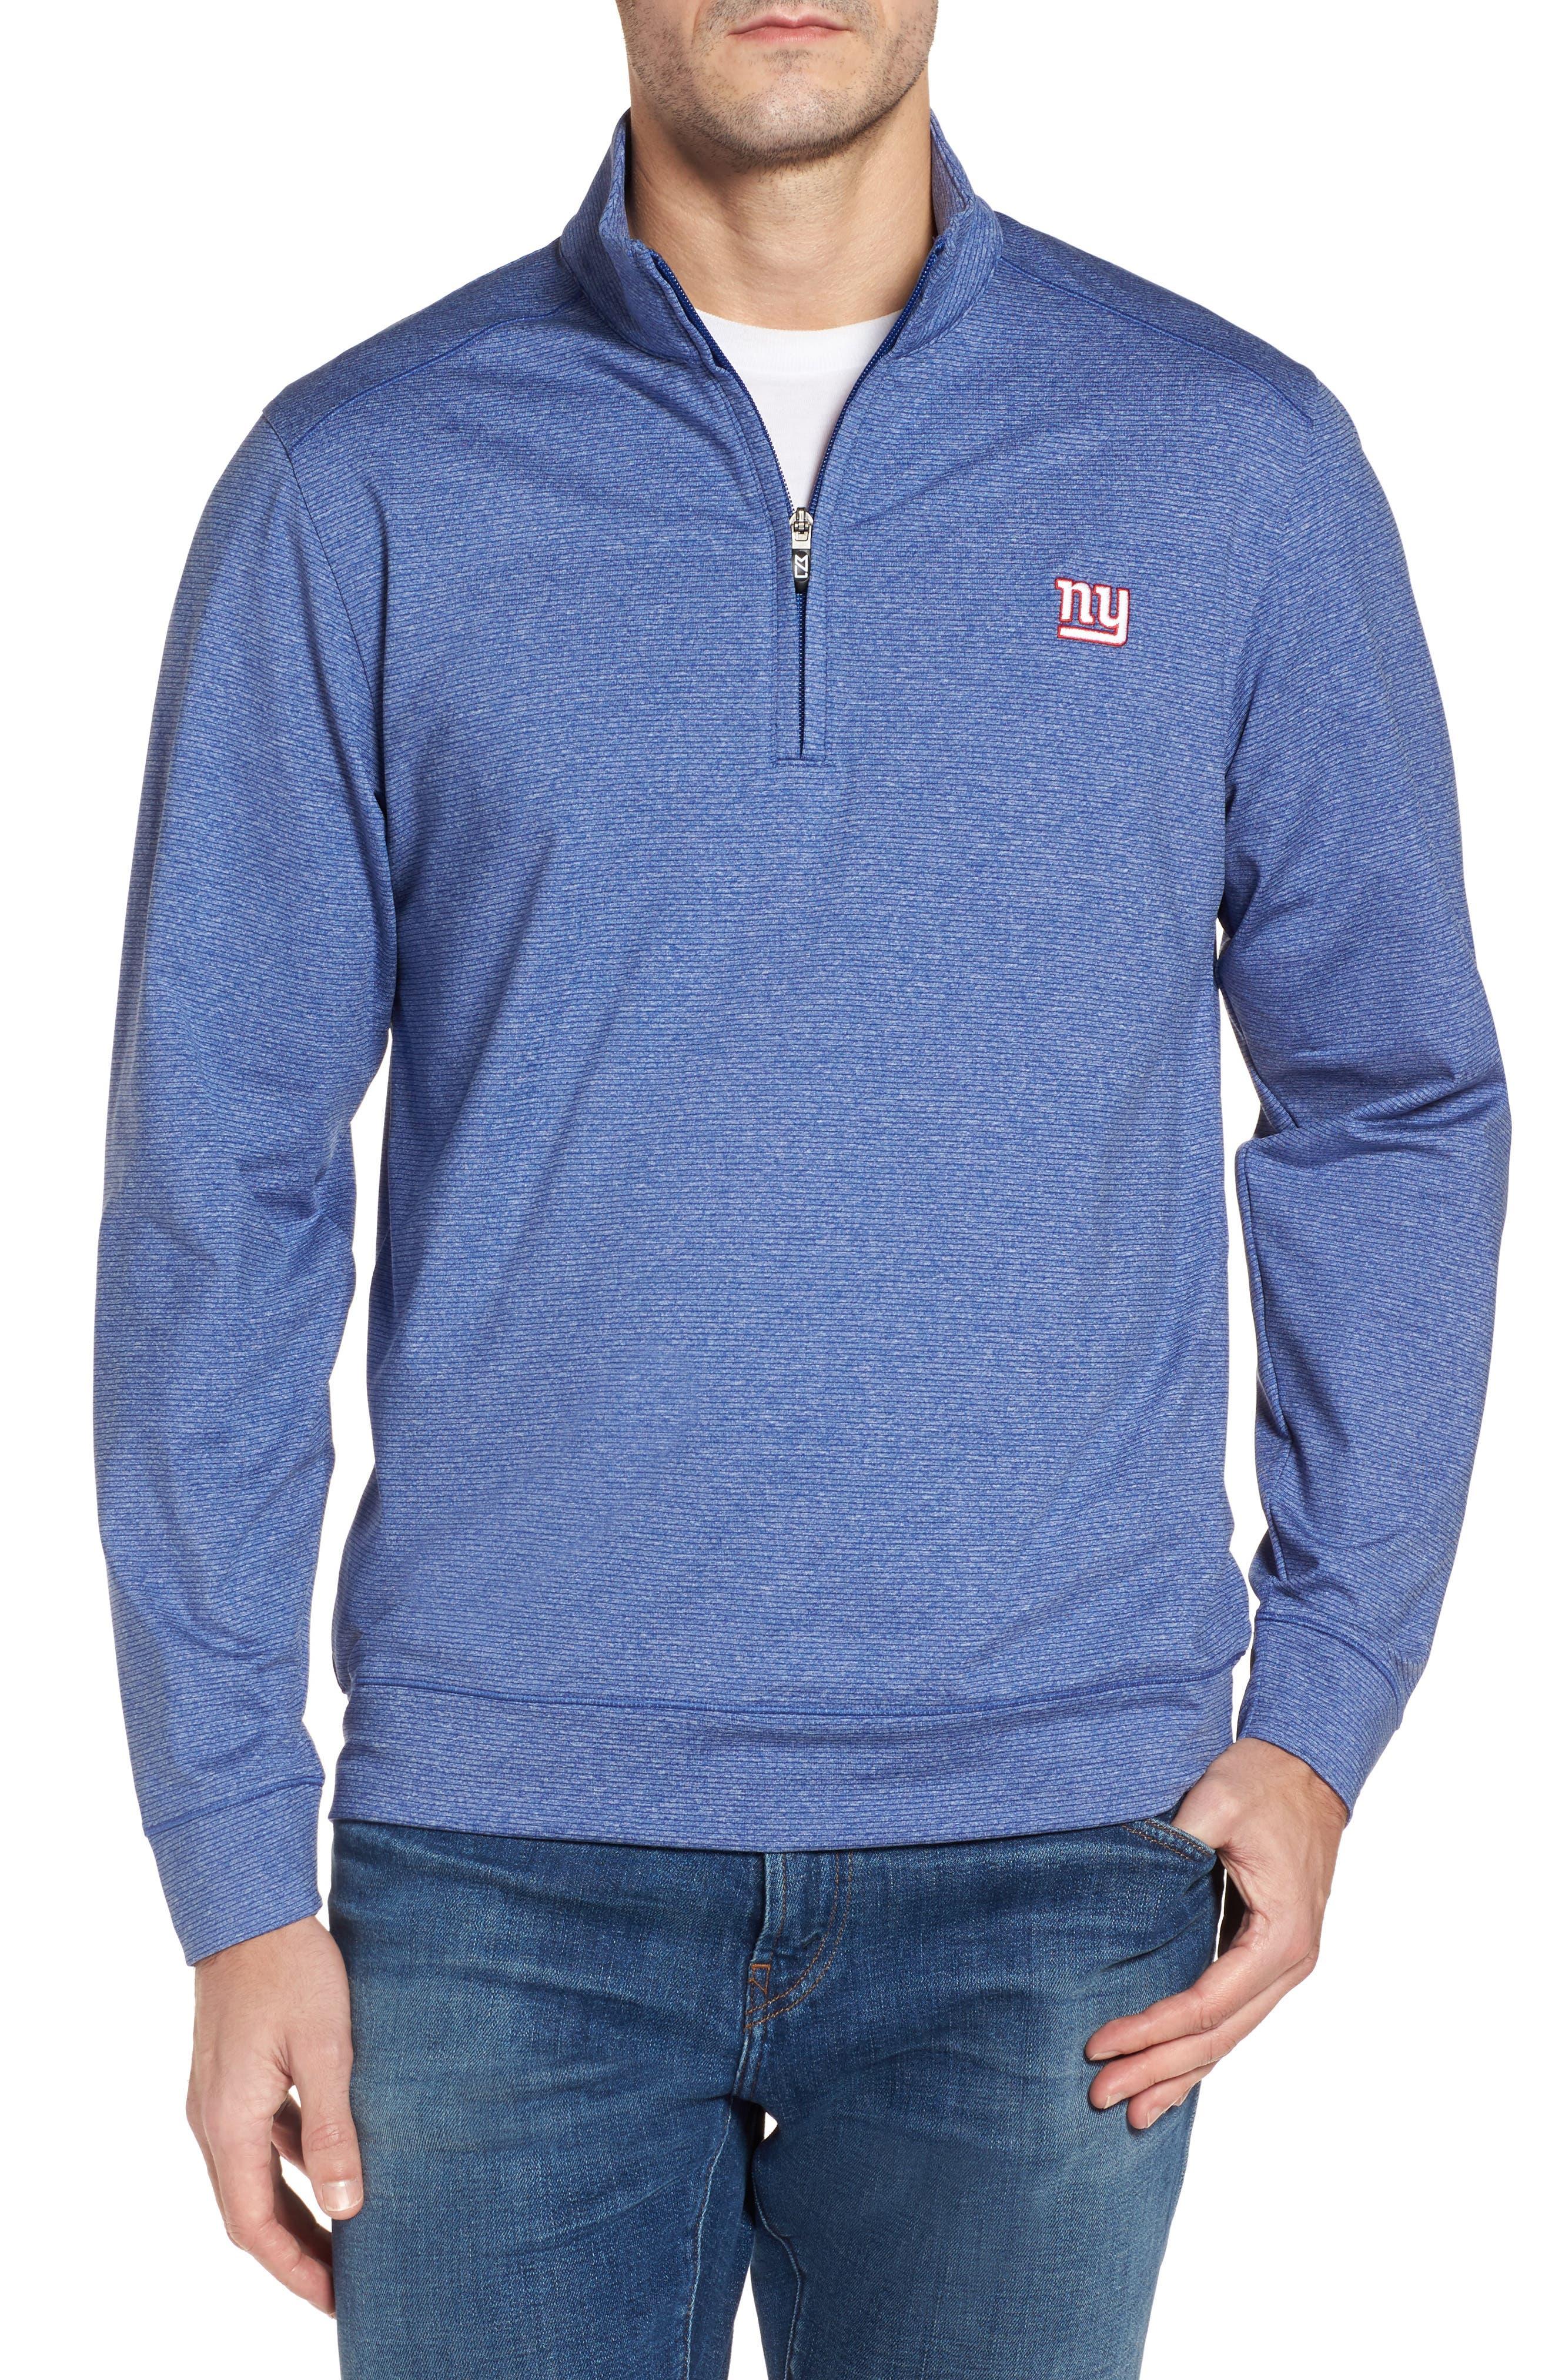 Shoreline - New York Giants Half Zip Pullover,                         Main,                         color, 425